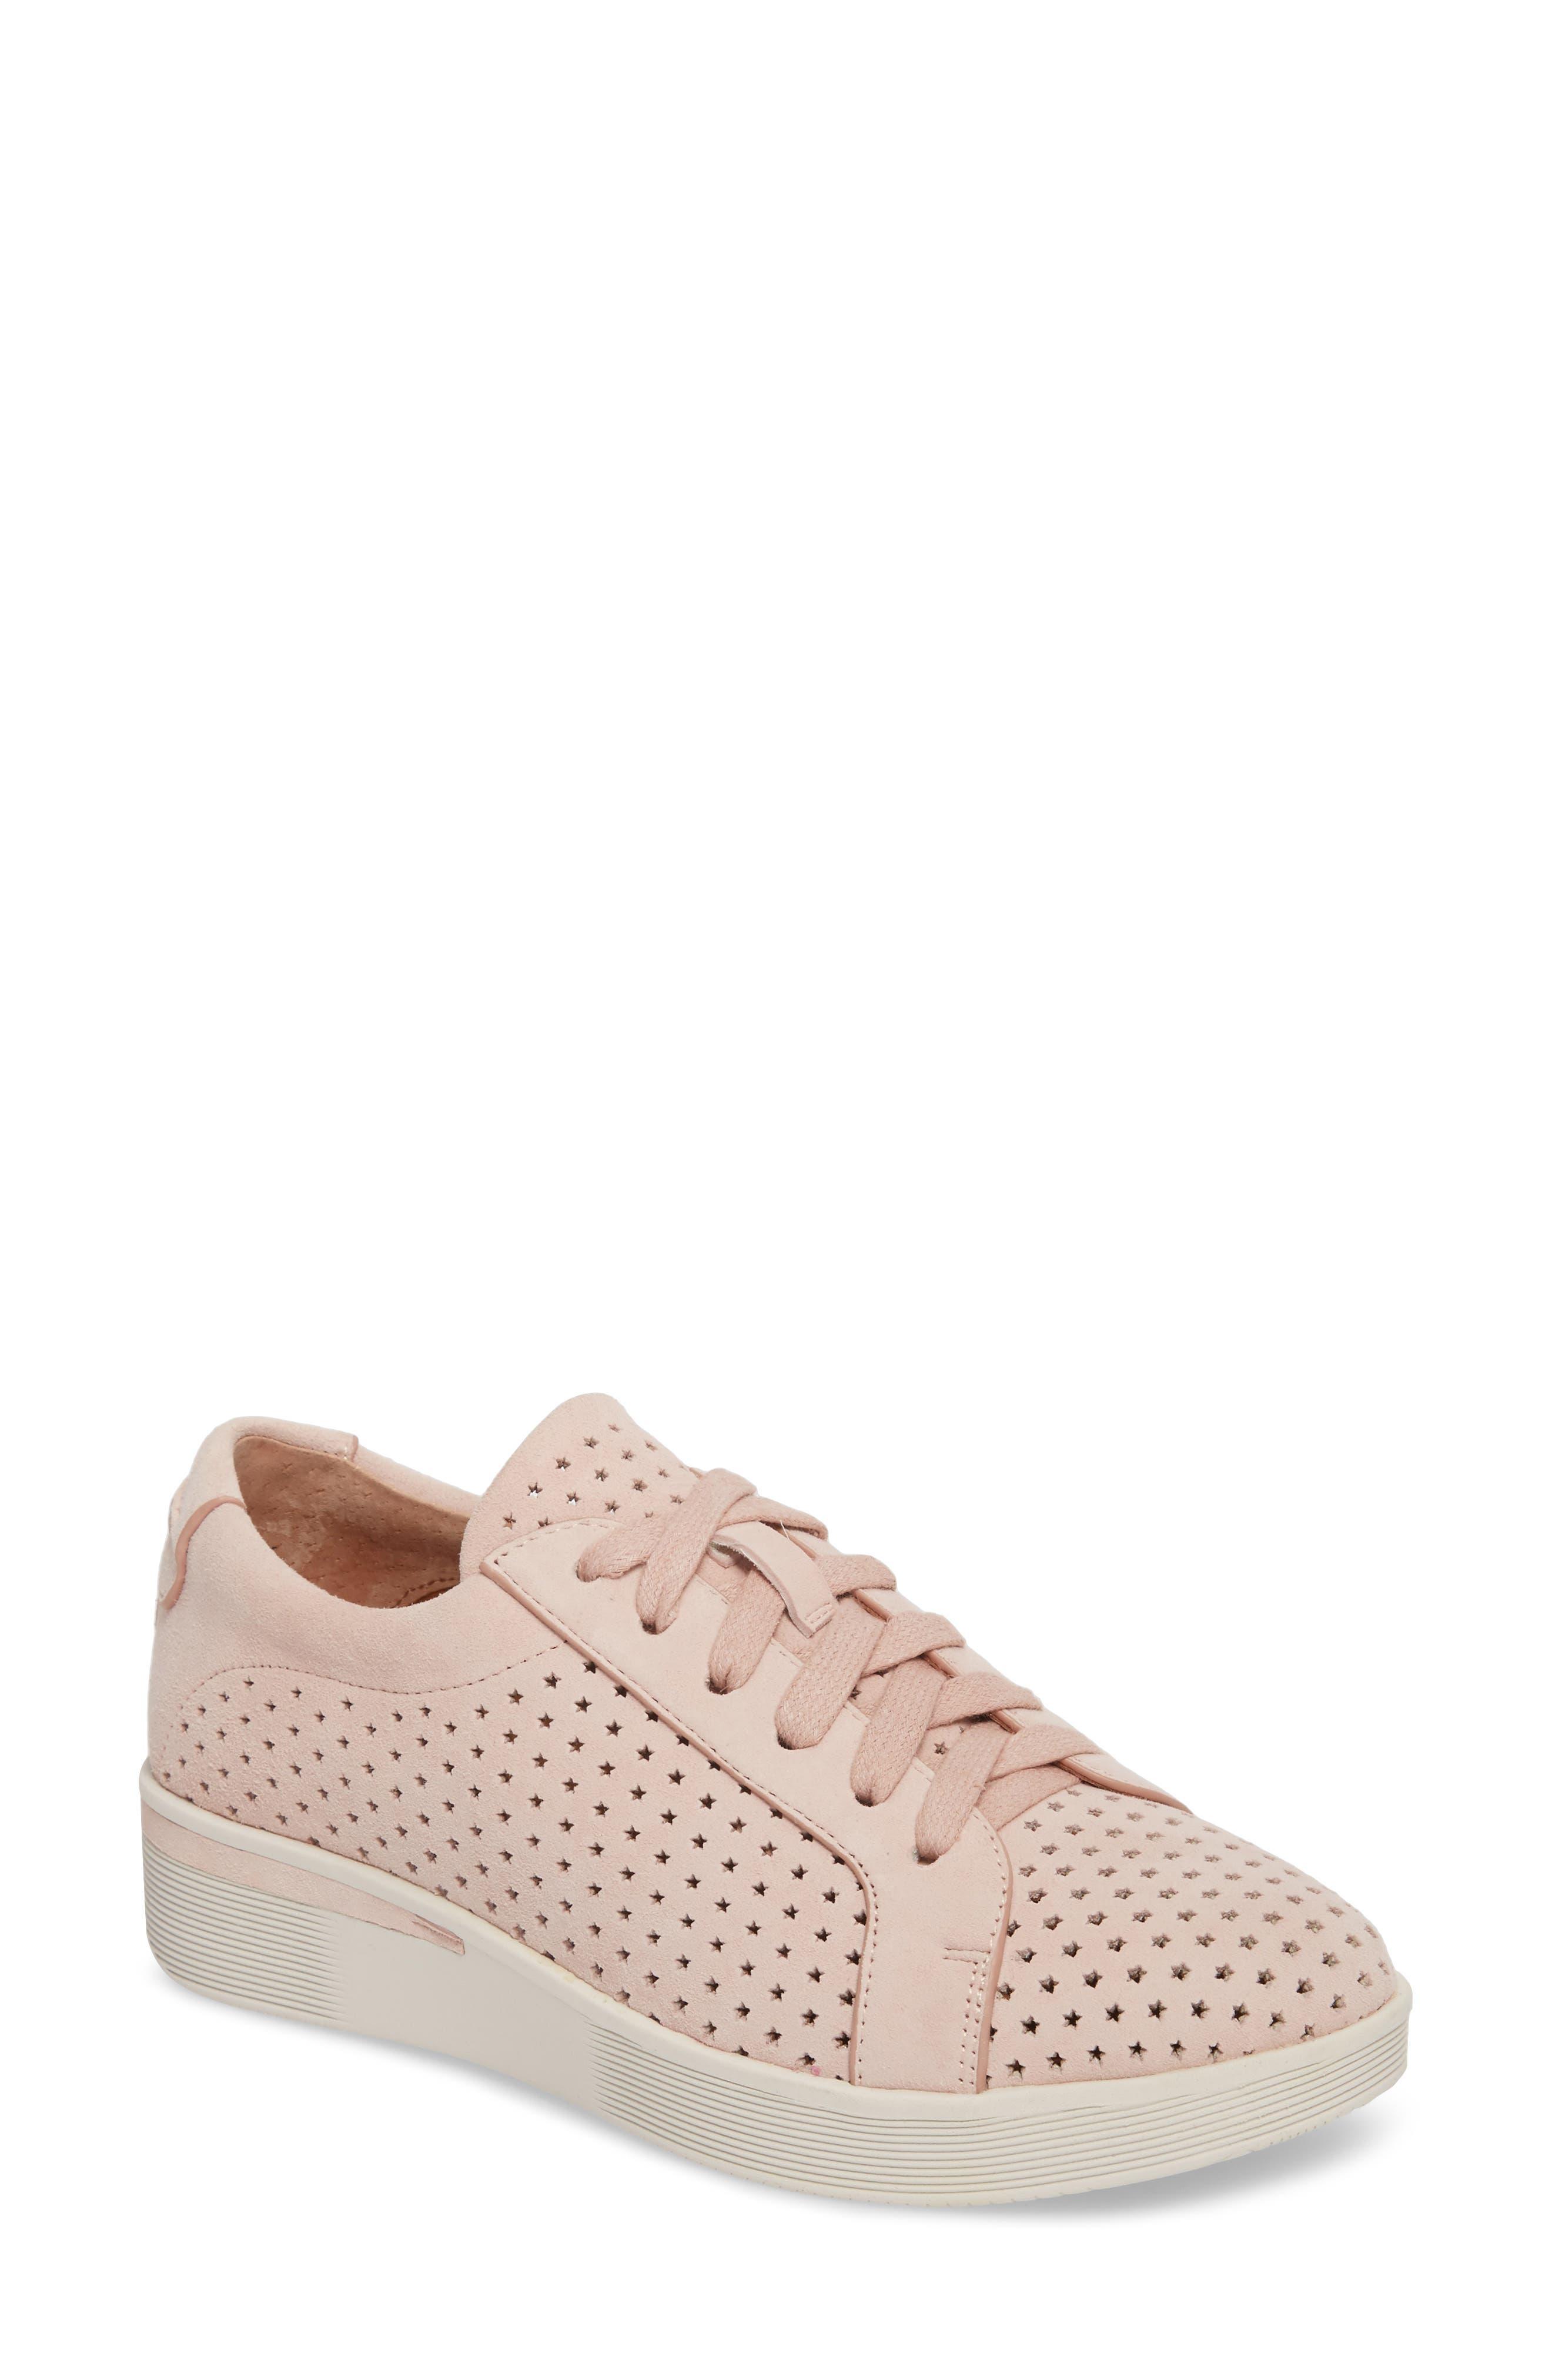 Gentle Souls By Kenneth Cole Haddie Low Platform Sneaker, Pink